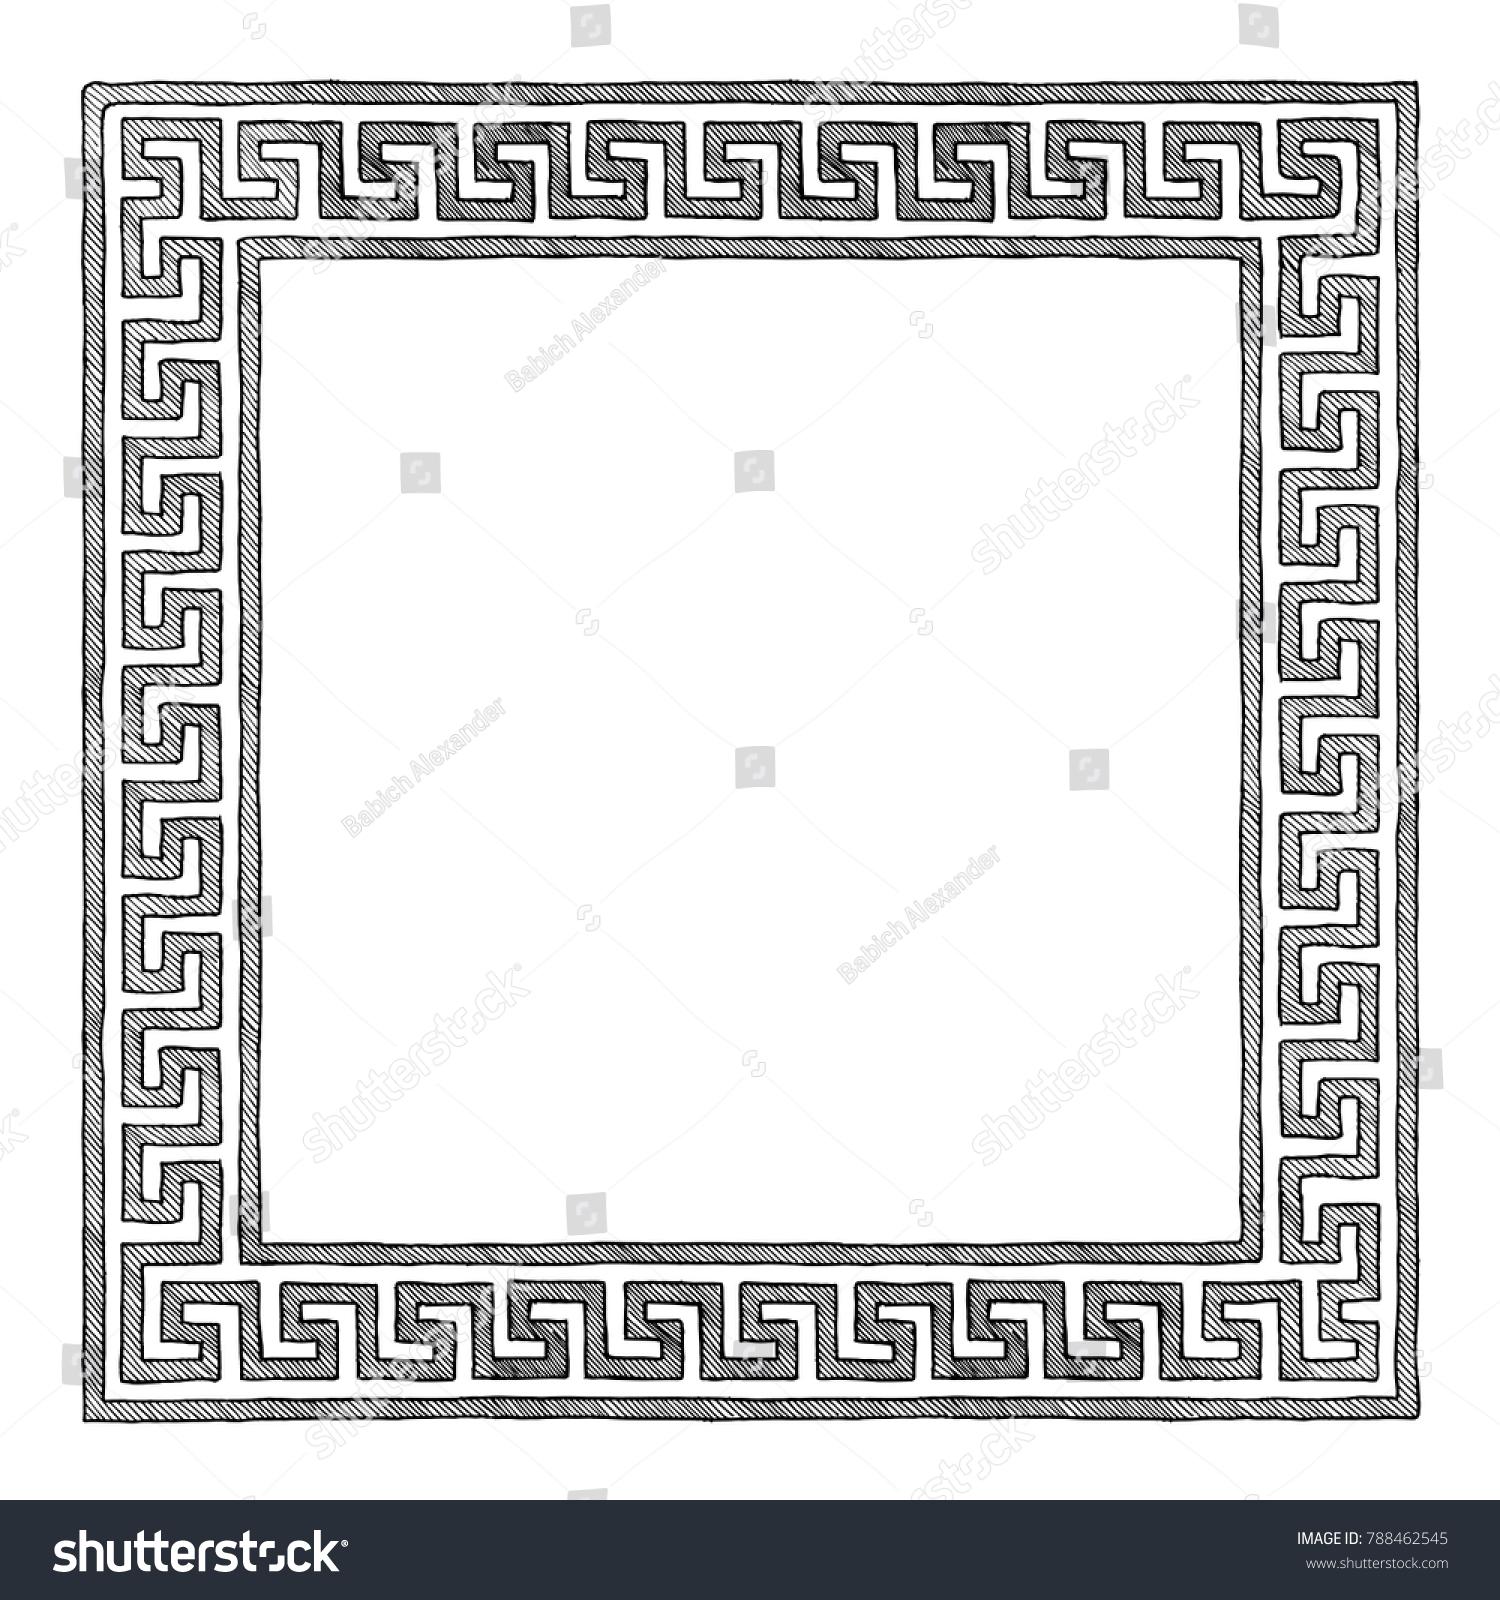 Frame traditional ancient greek border meander stock vector frame with traditional ancient greek border meander illustration in vintage engraving style jeuxipadfo Gallery